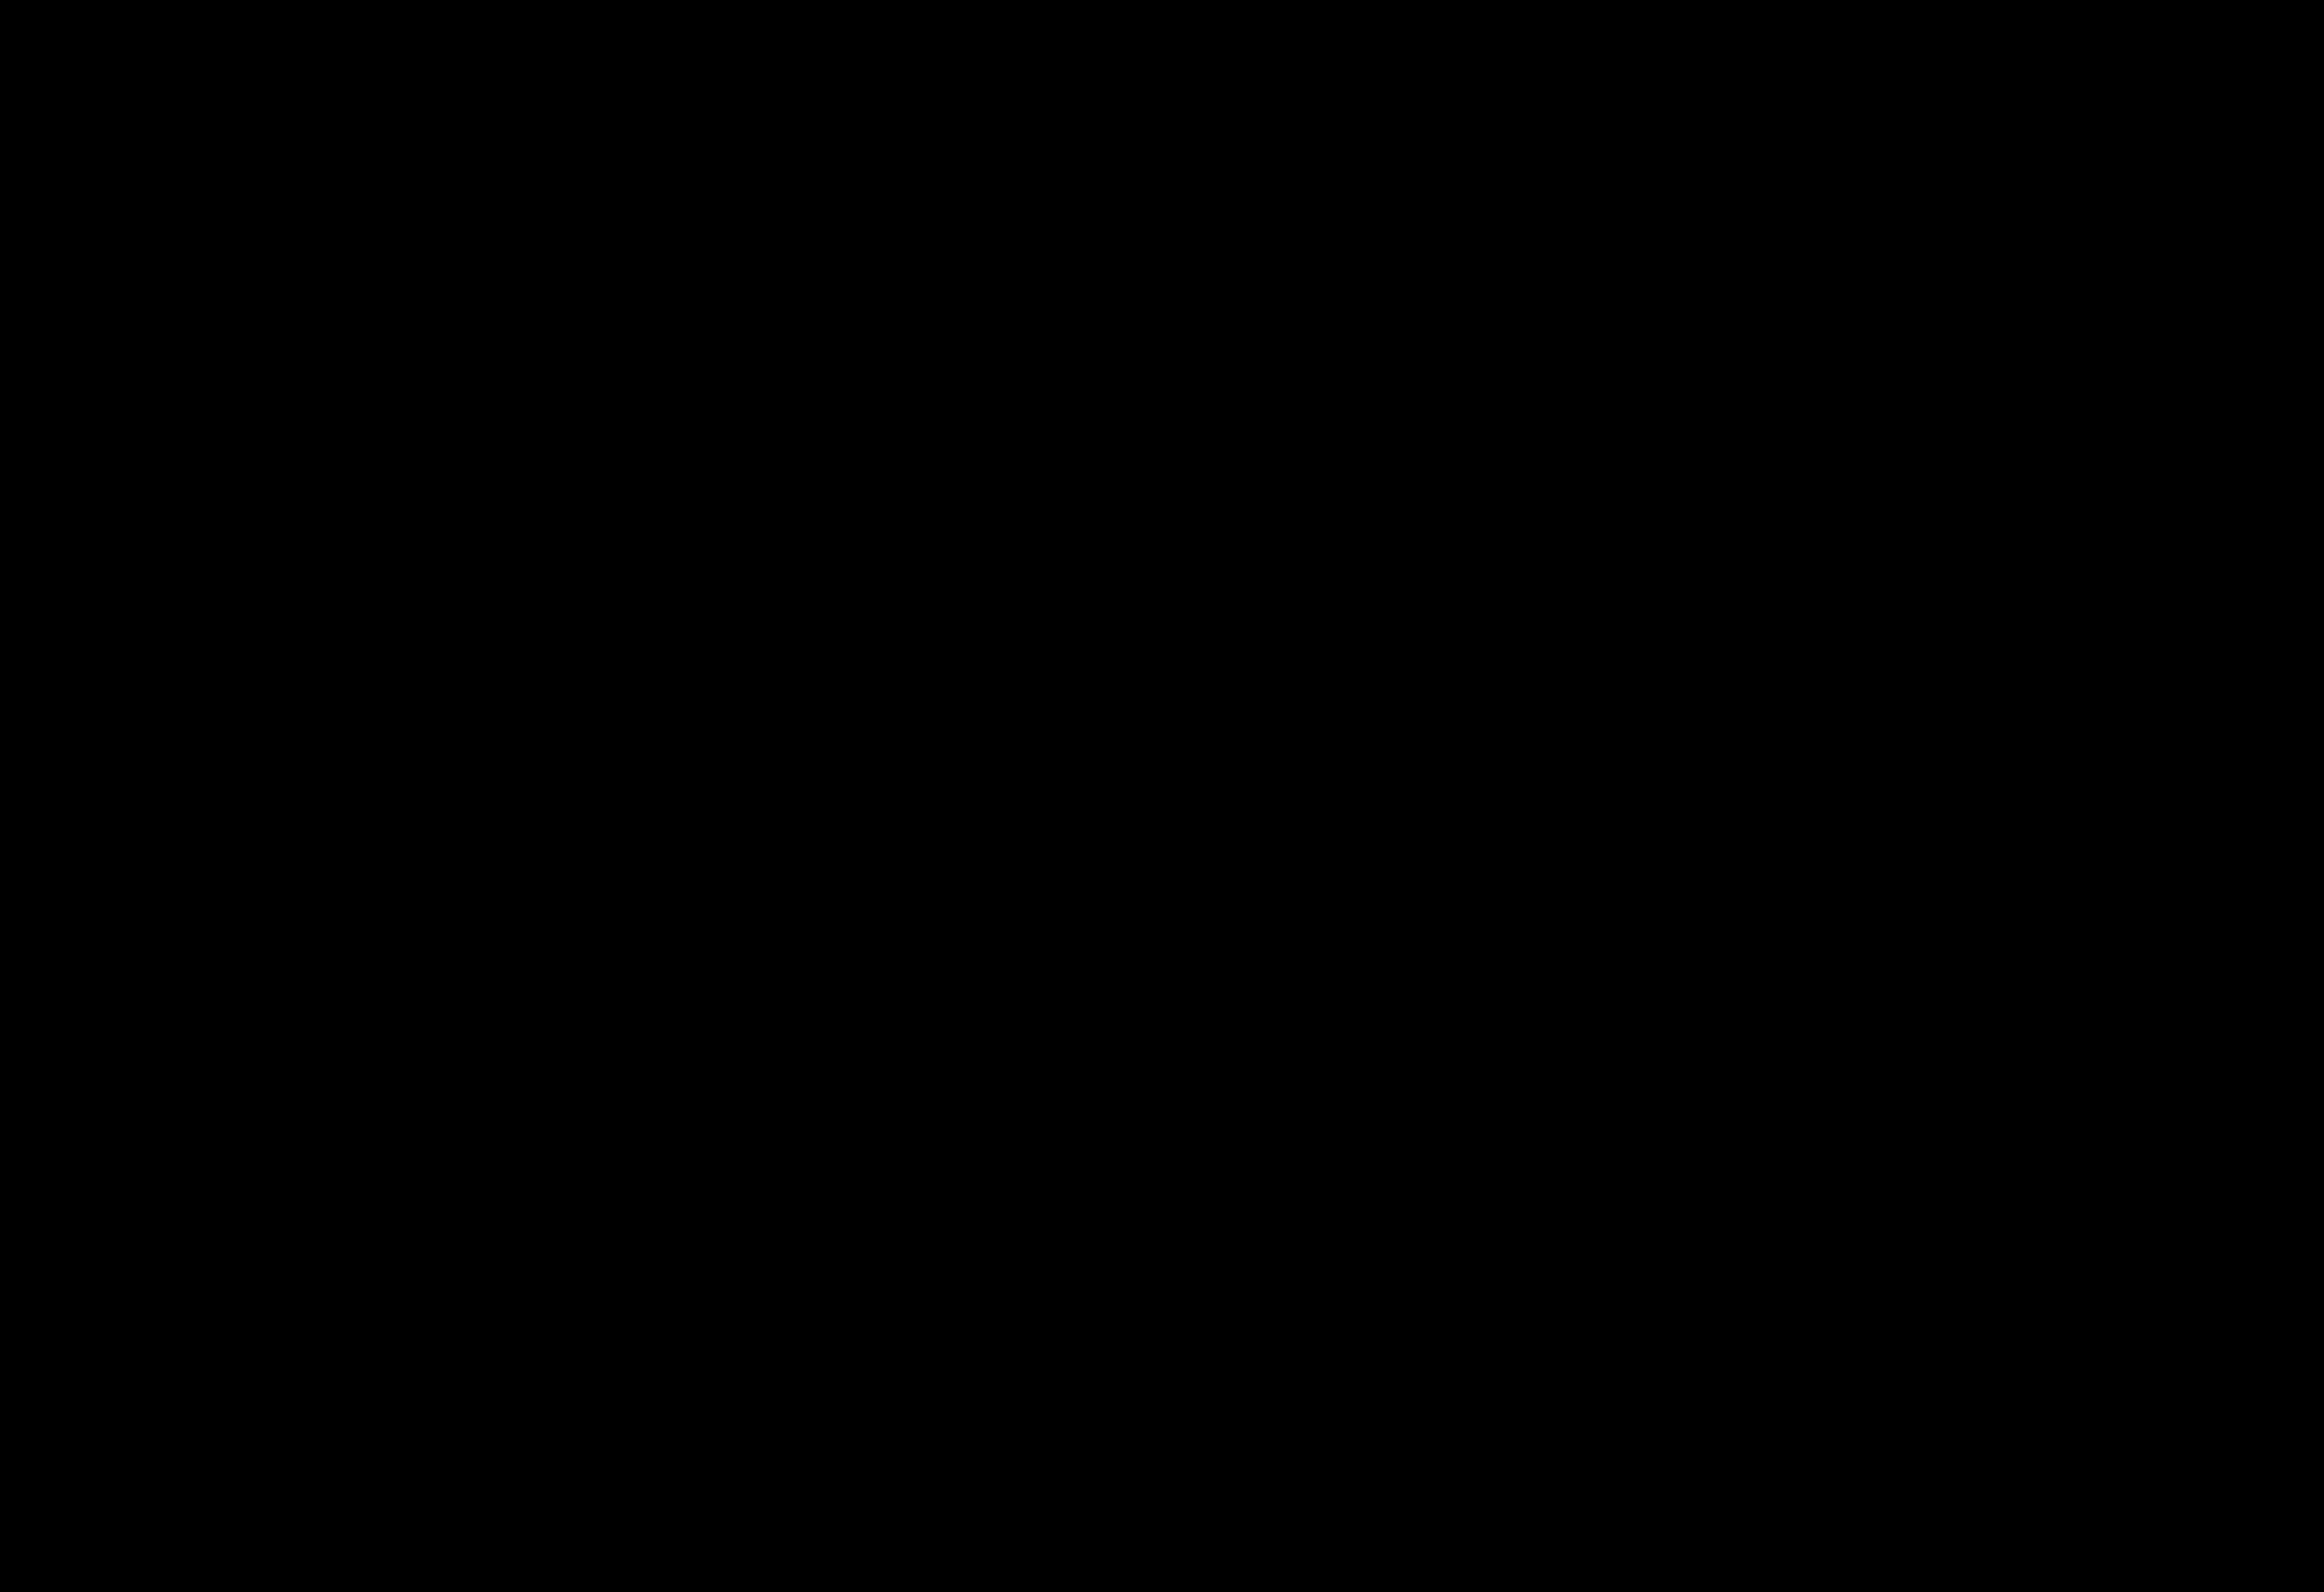 WCM0033.png